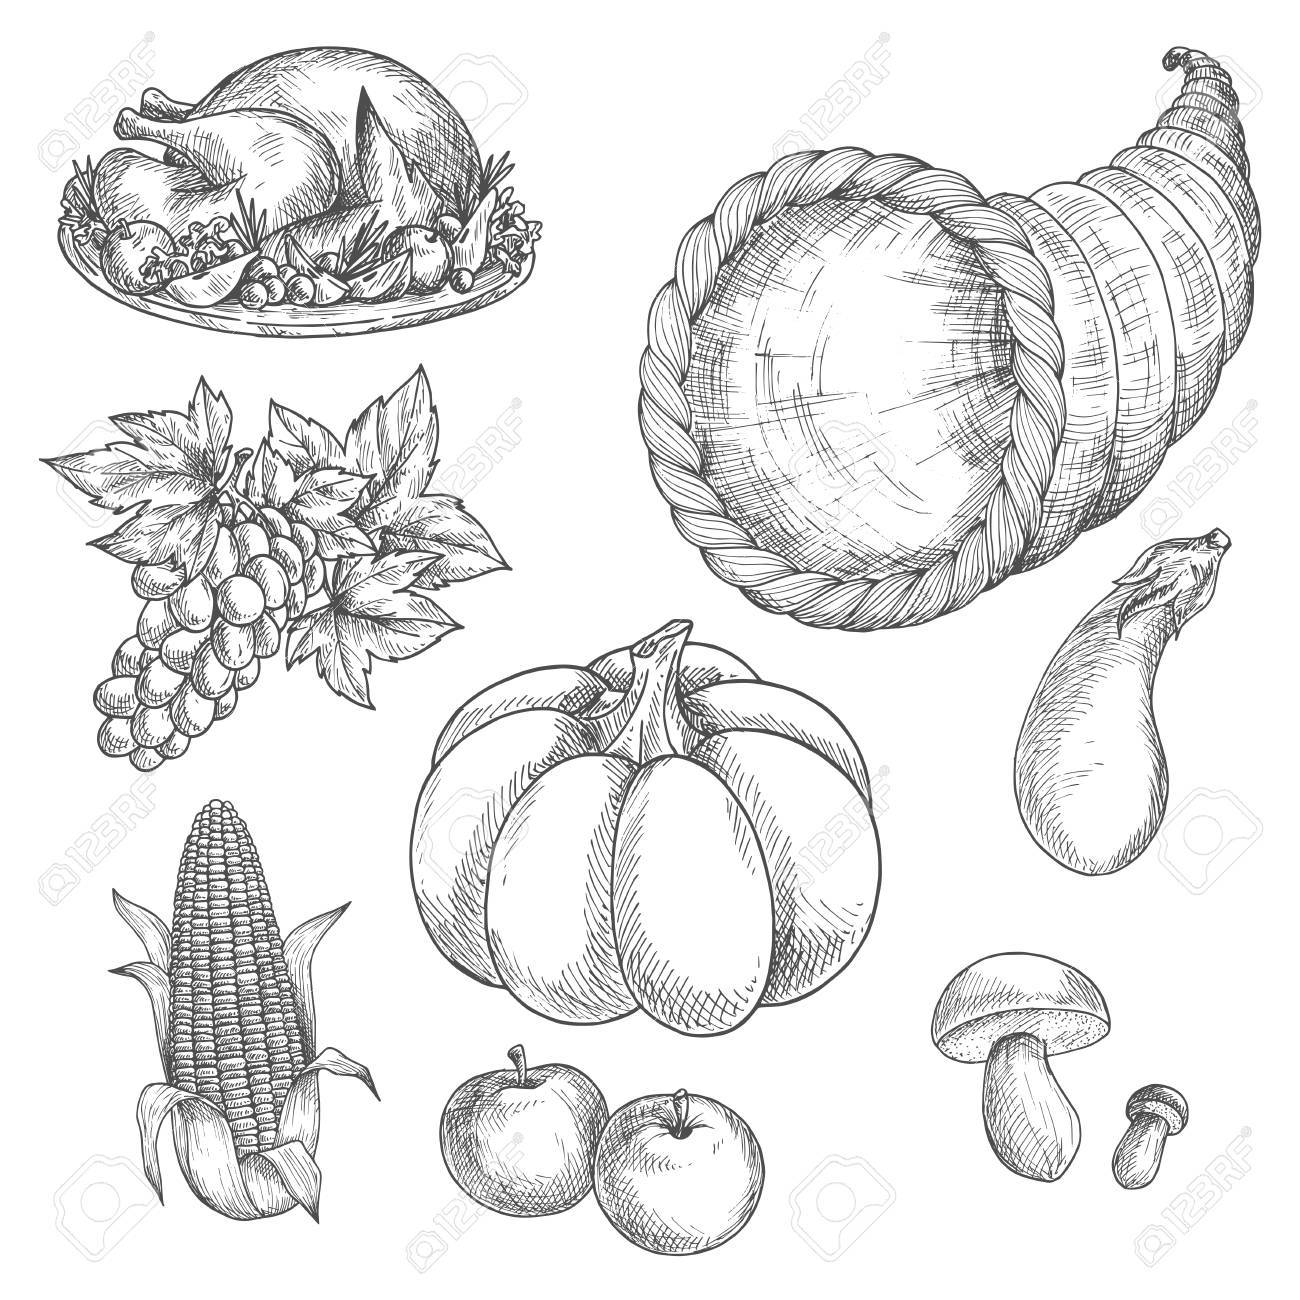 Thanksgiving-Tag-Symbole. Vektor-Skizze Gebratener Truthahn Gericht ...